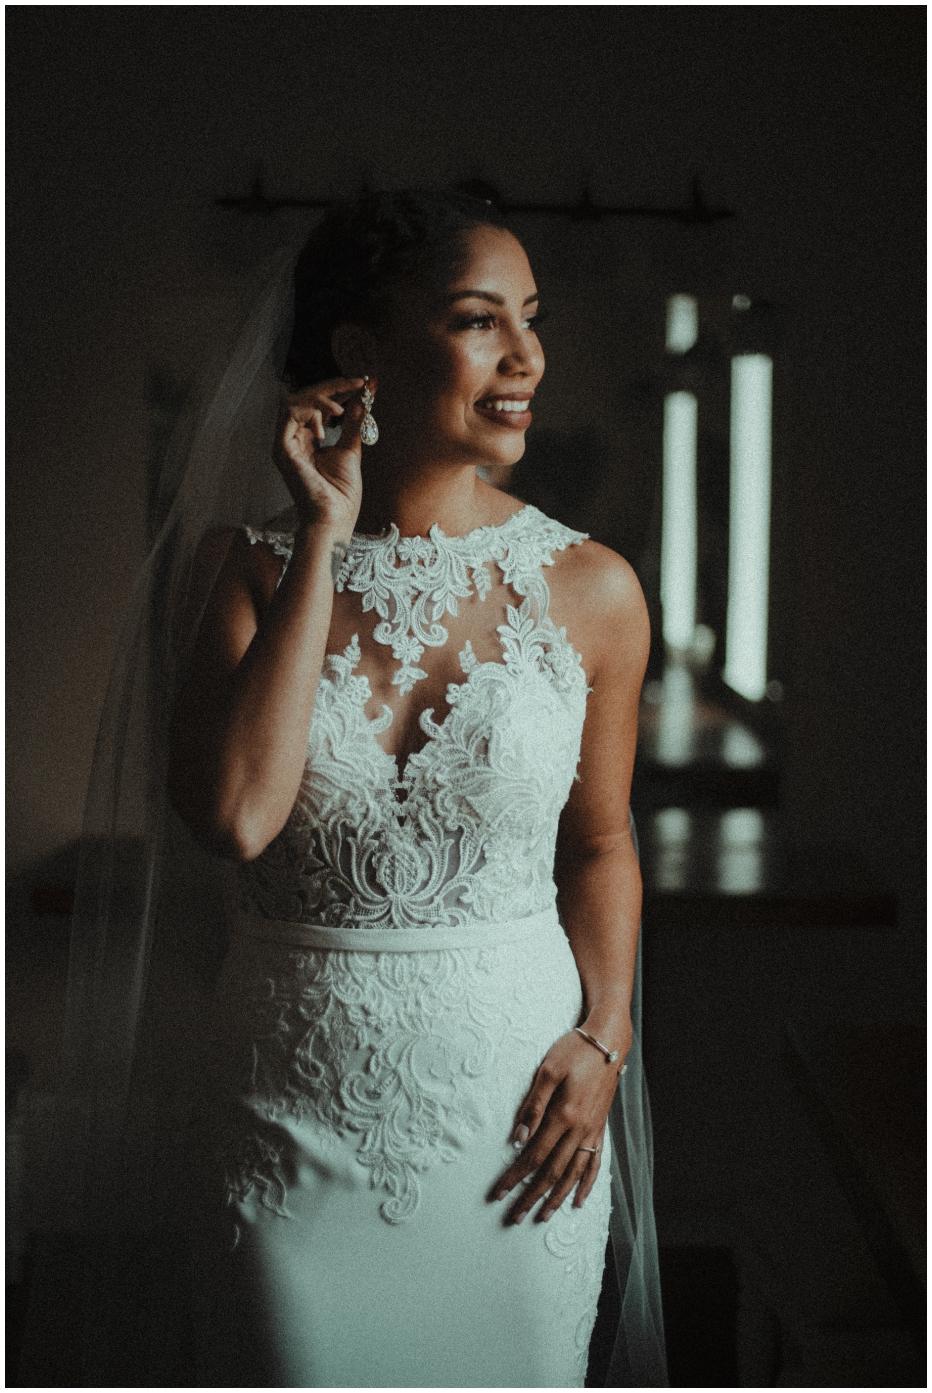 Posh-Moments-Photography-NC- Wedding-Photographer-Rolling-Hills-Farms-Wedding-Monroe-NC-Charlotte-NC_0241.jpg